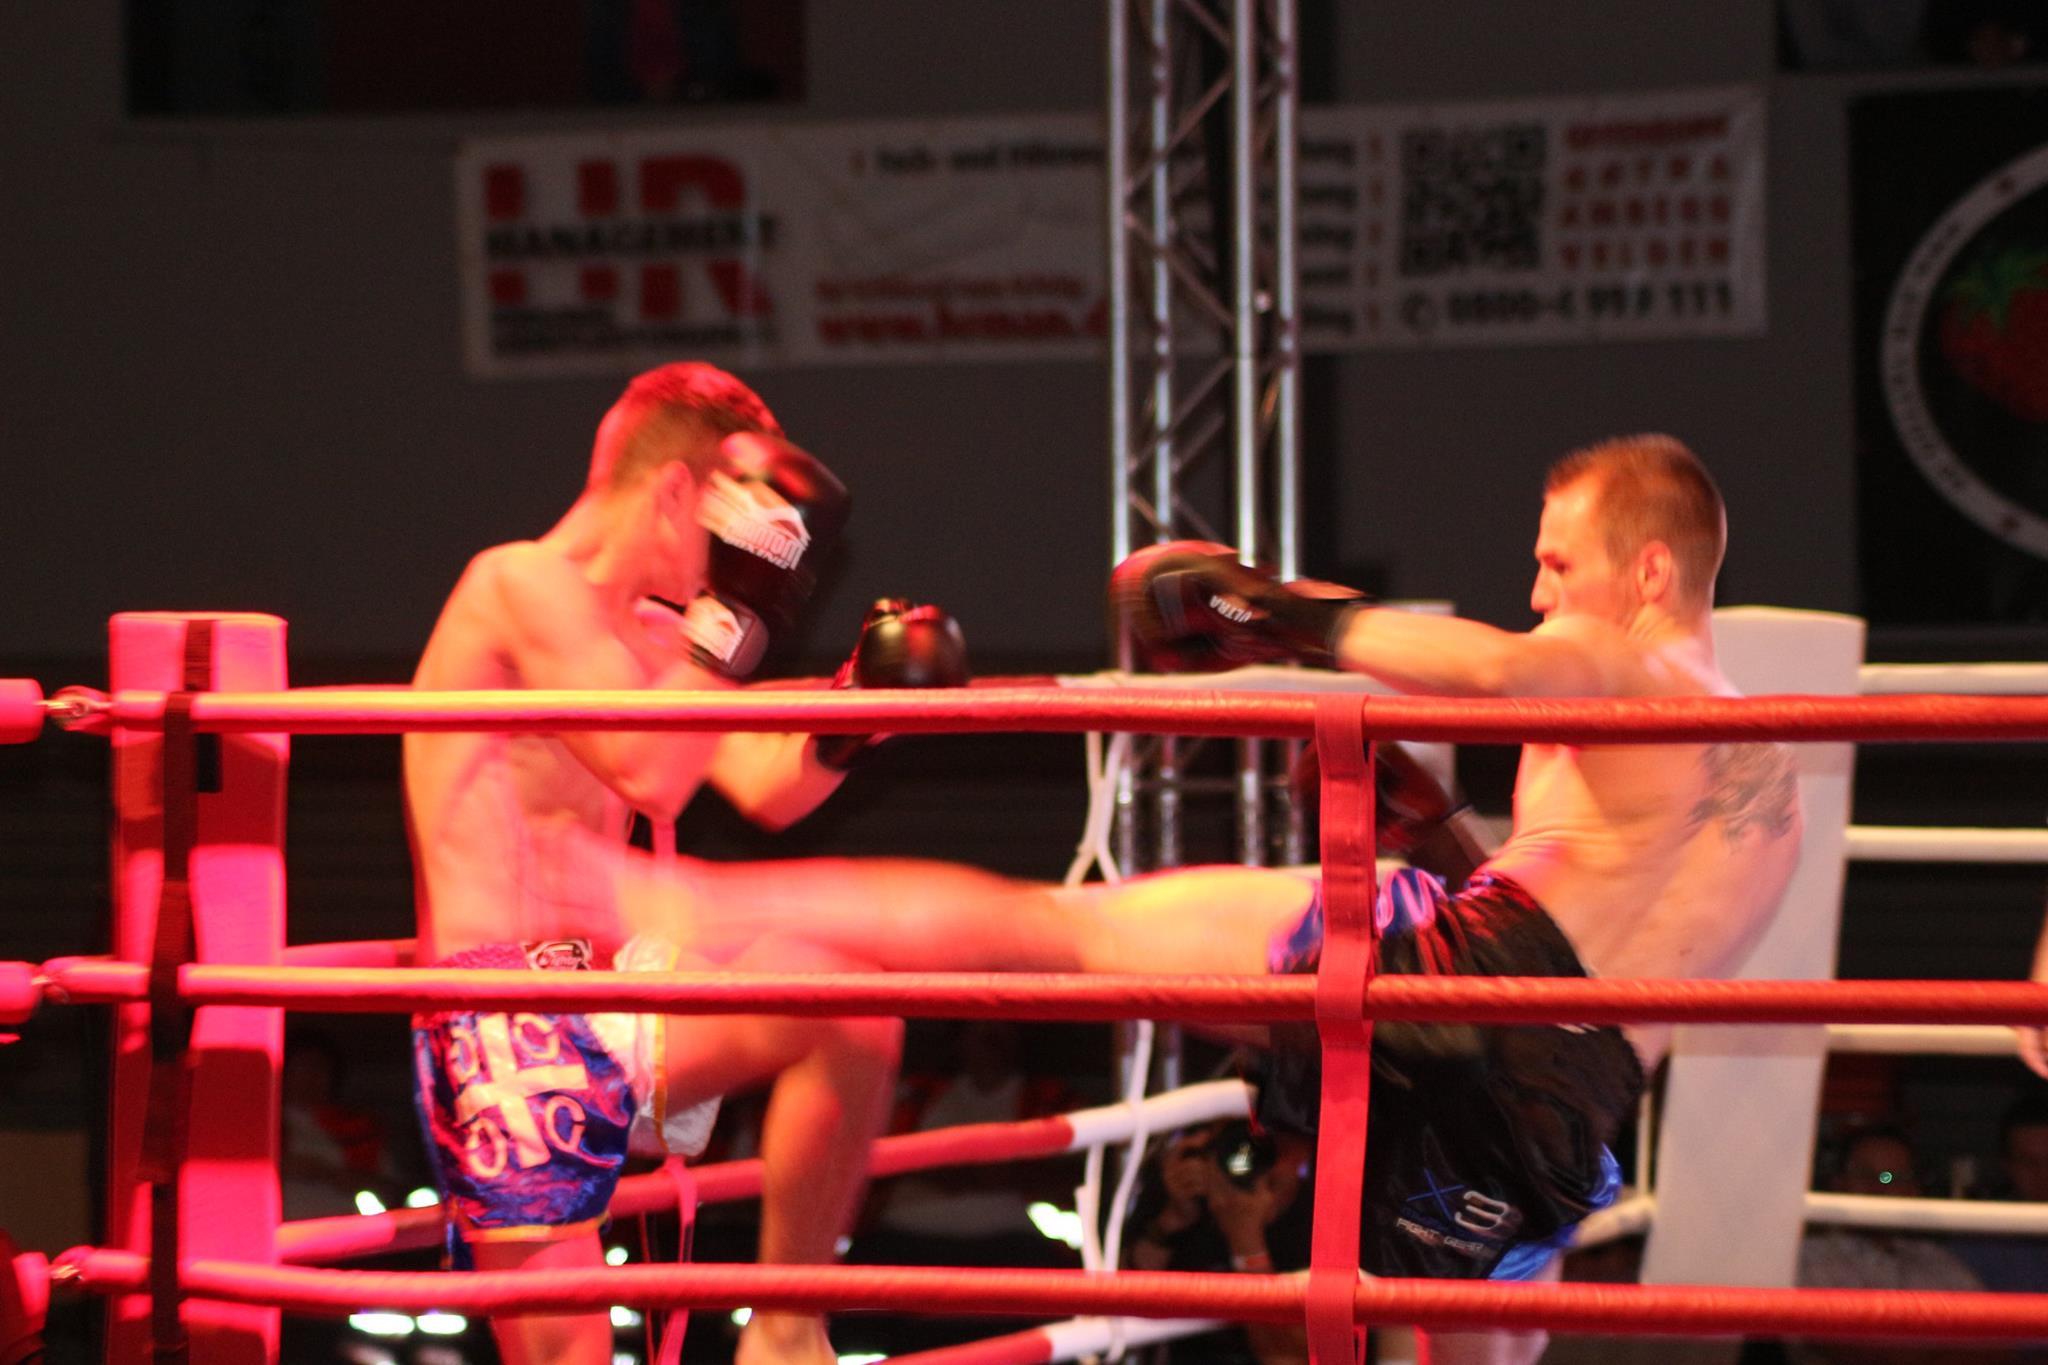 Mirkos Fihgt Night, Schutterwald, Offenburg, Kickboxen, K1, MMA-1